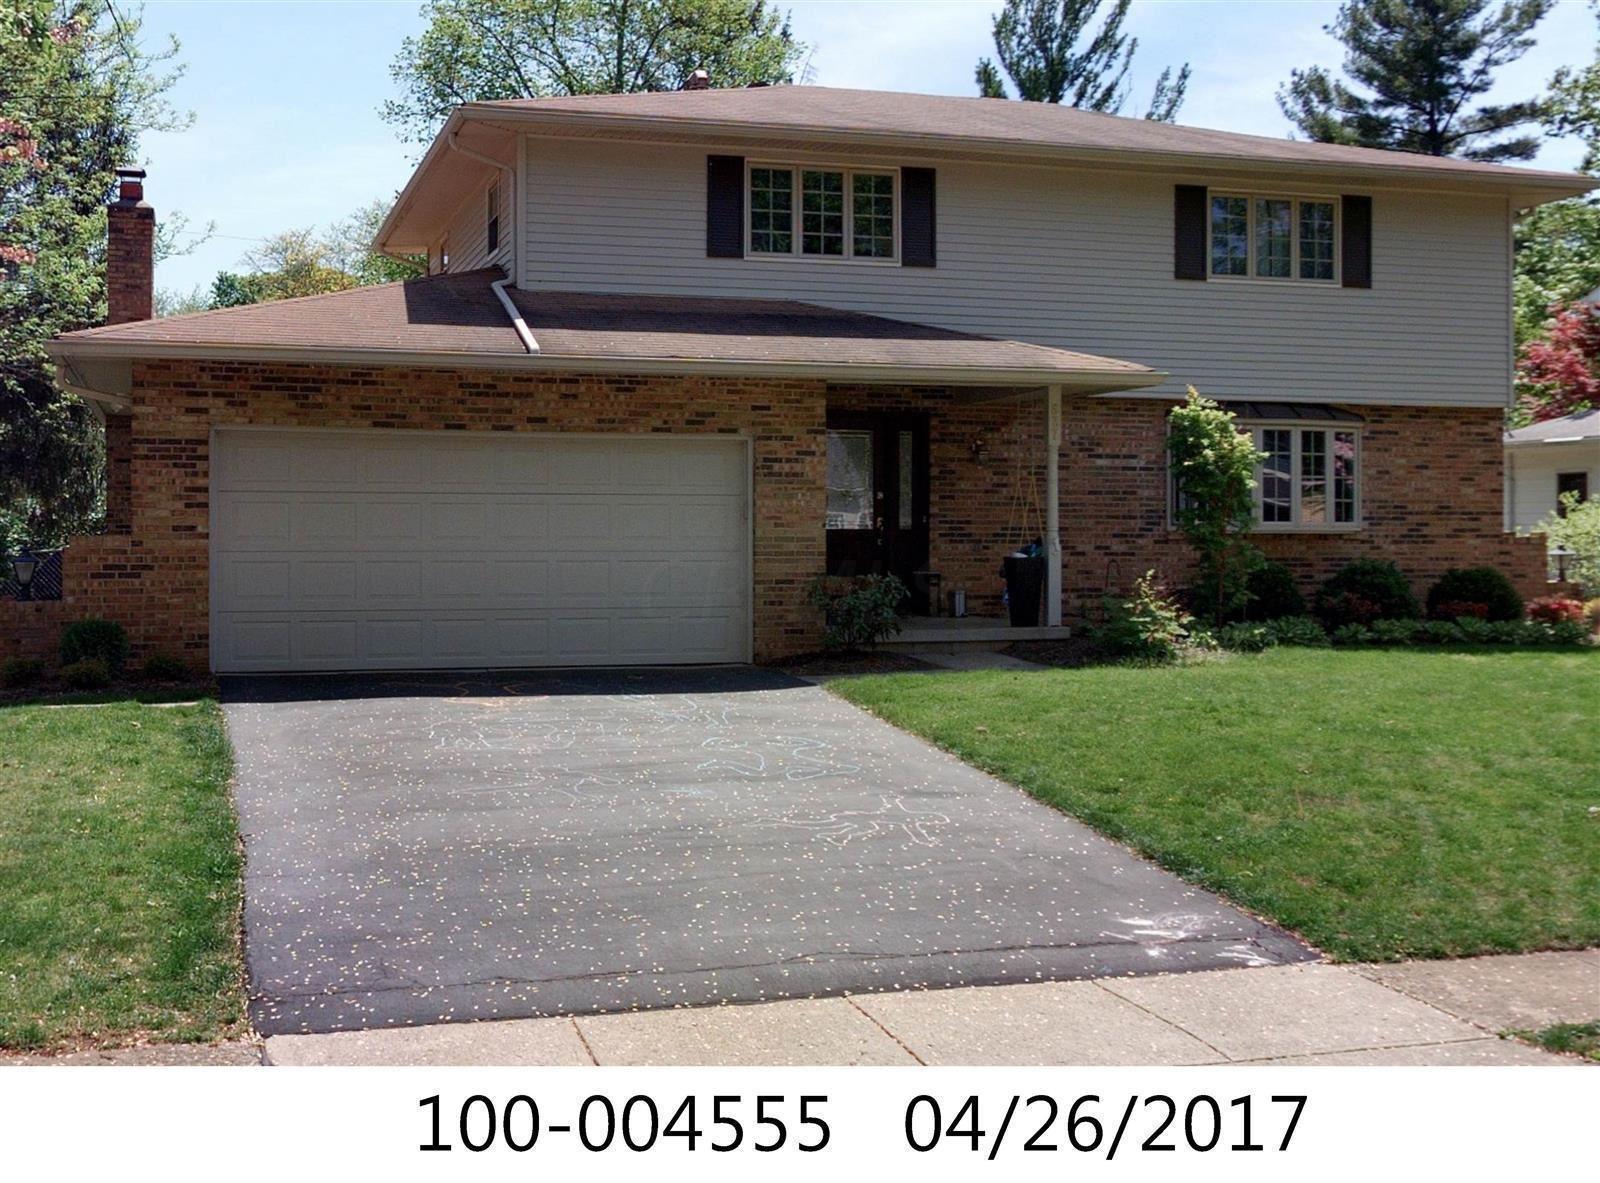 Photo of 537 Poe Avenue, Worthington, OH 43085 (MLS # 221012467)